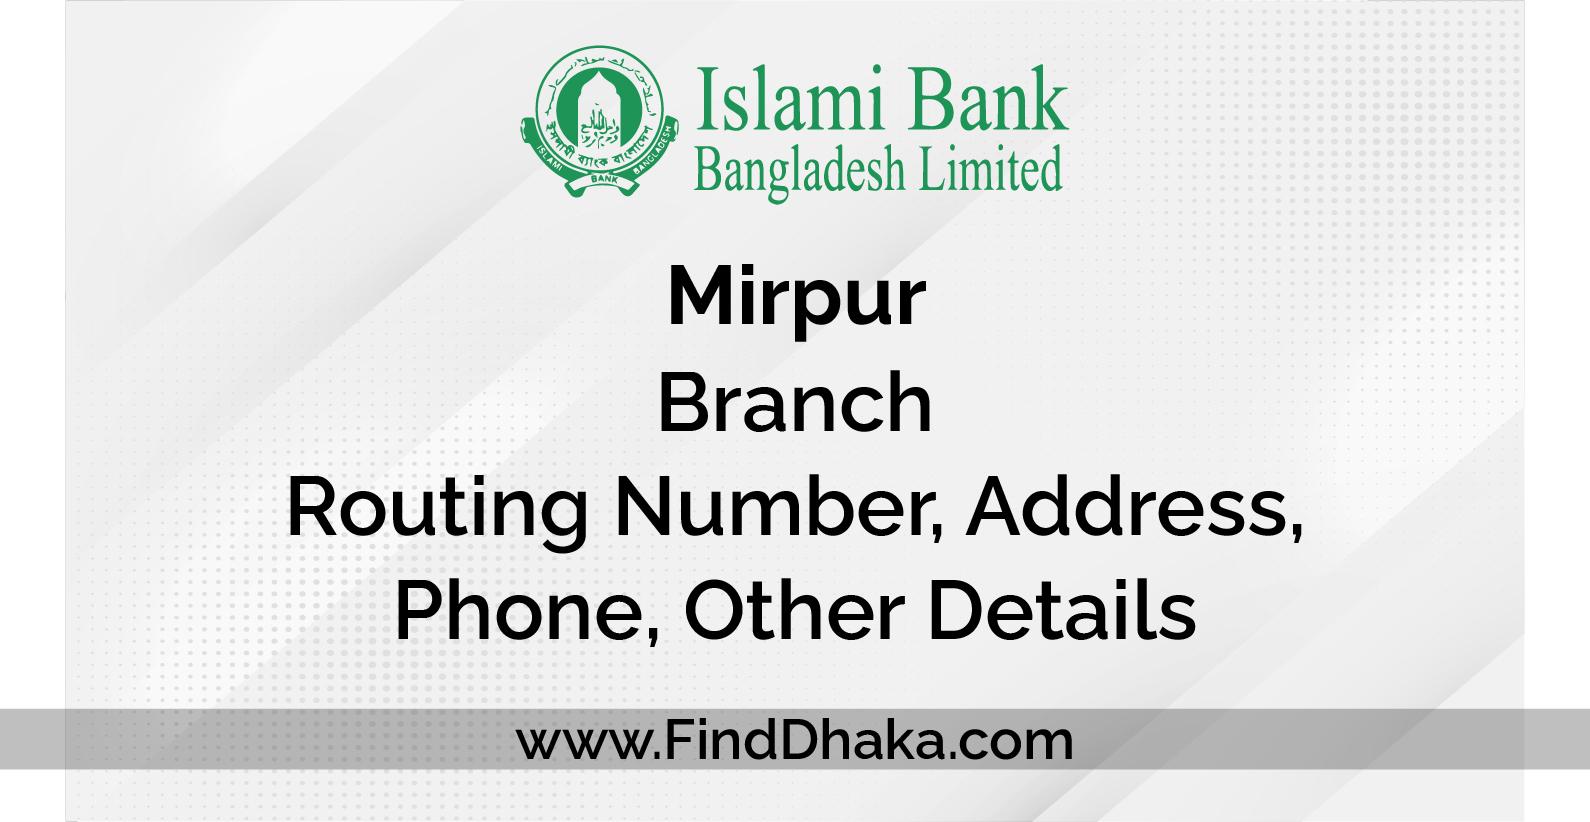 Islami Bank info007000 1